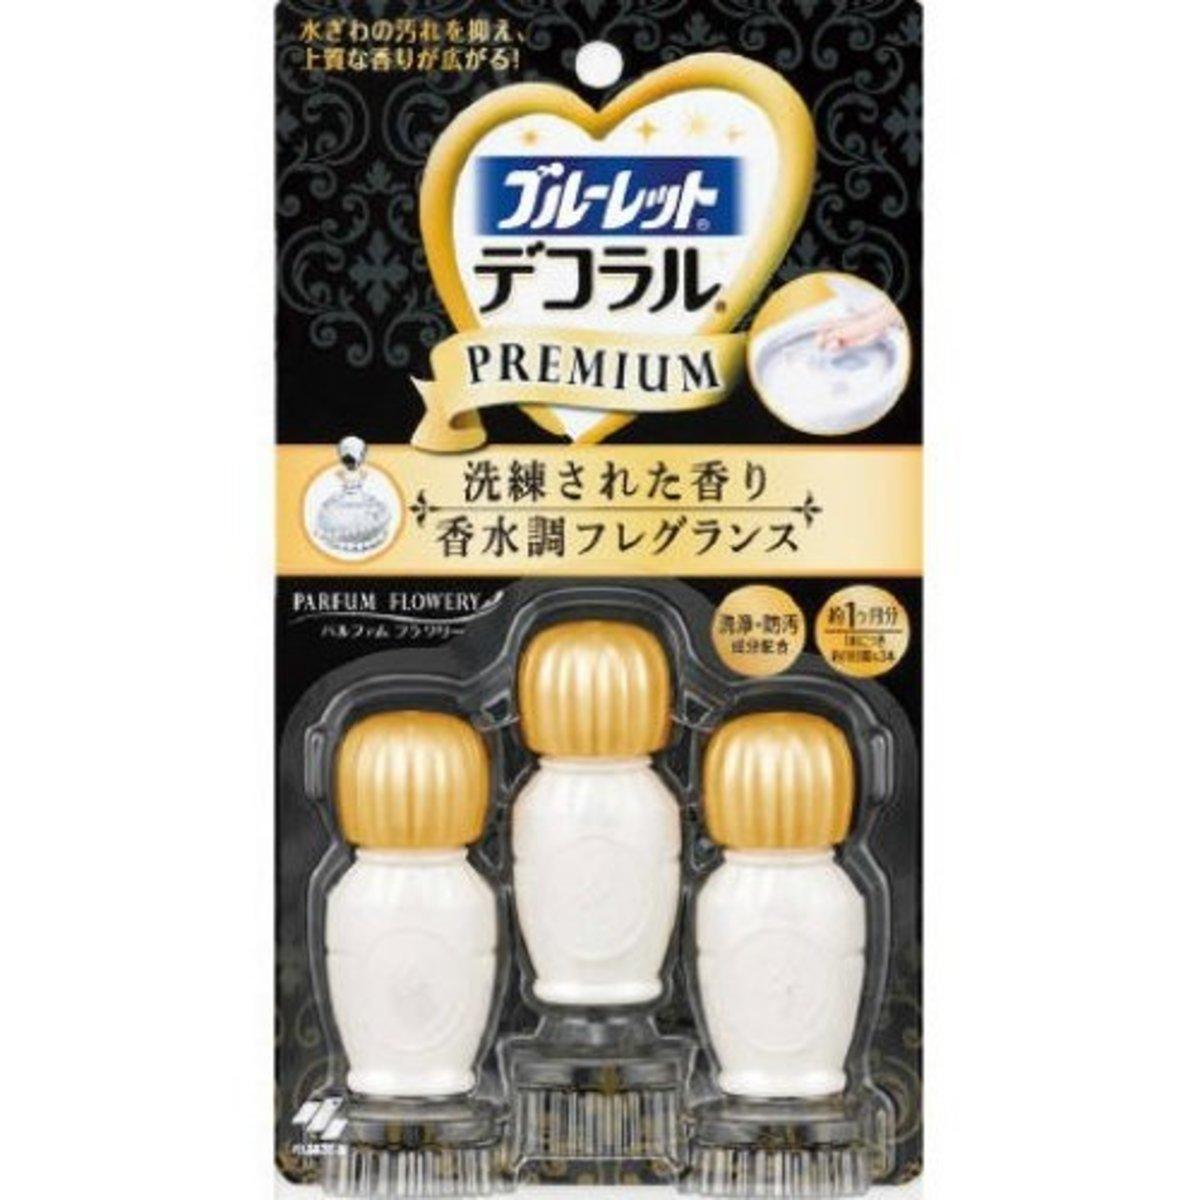 Bluelet Decoral Premium Parfum Flowery 23 g (Made in Japan)